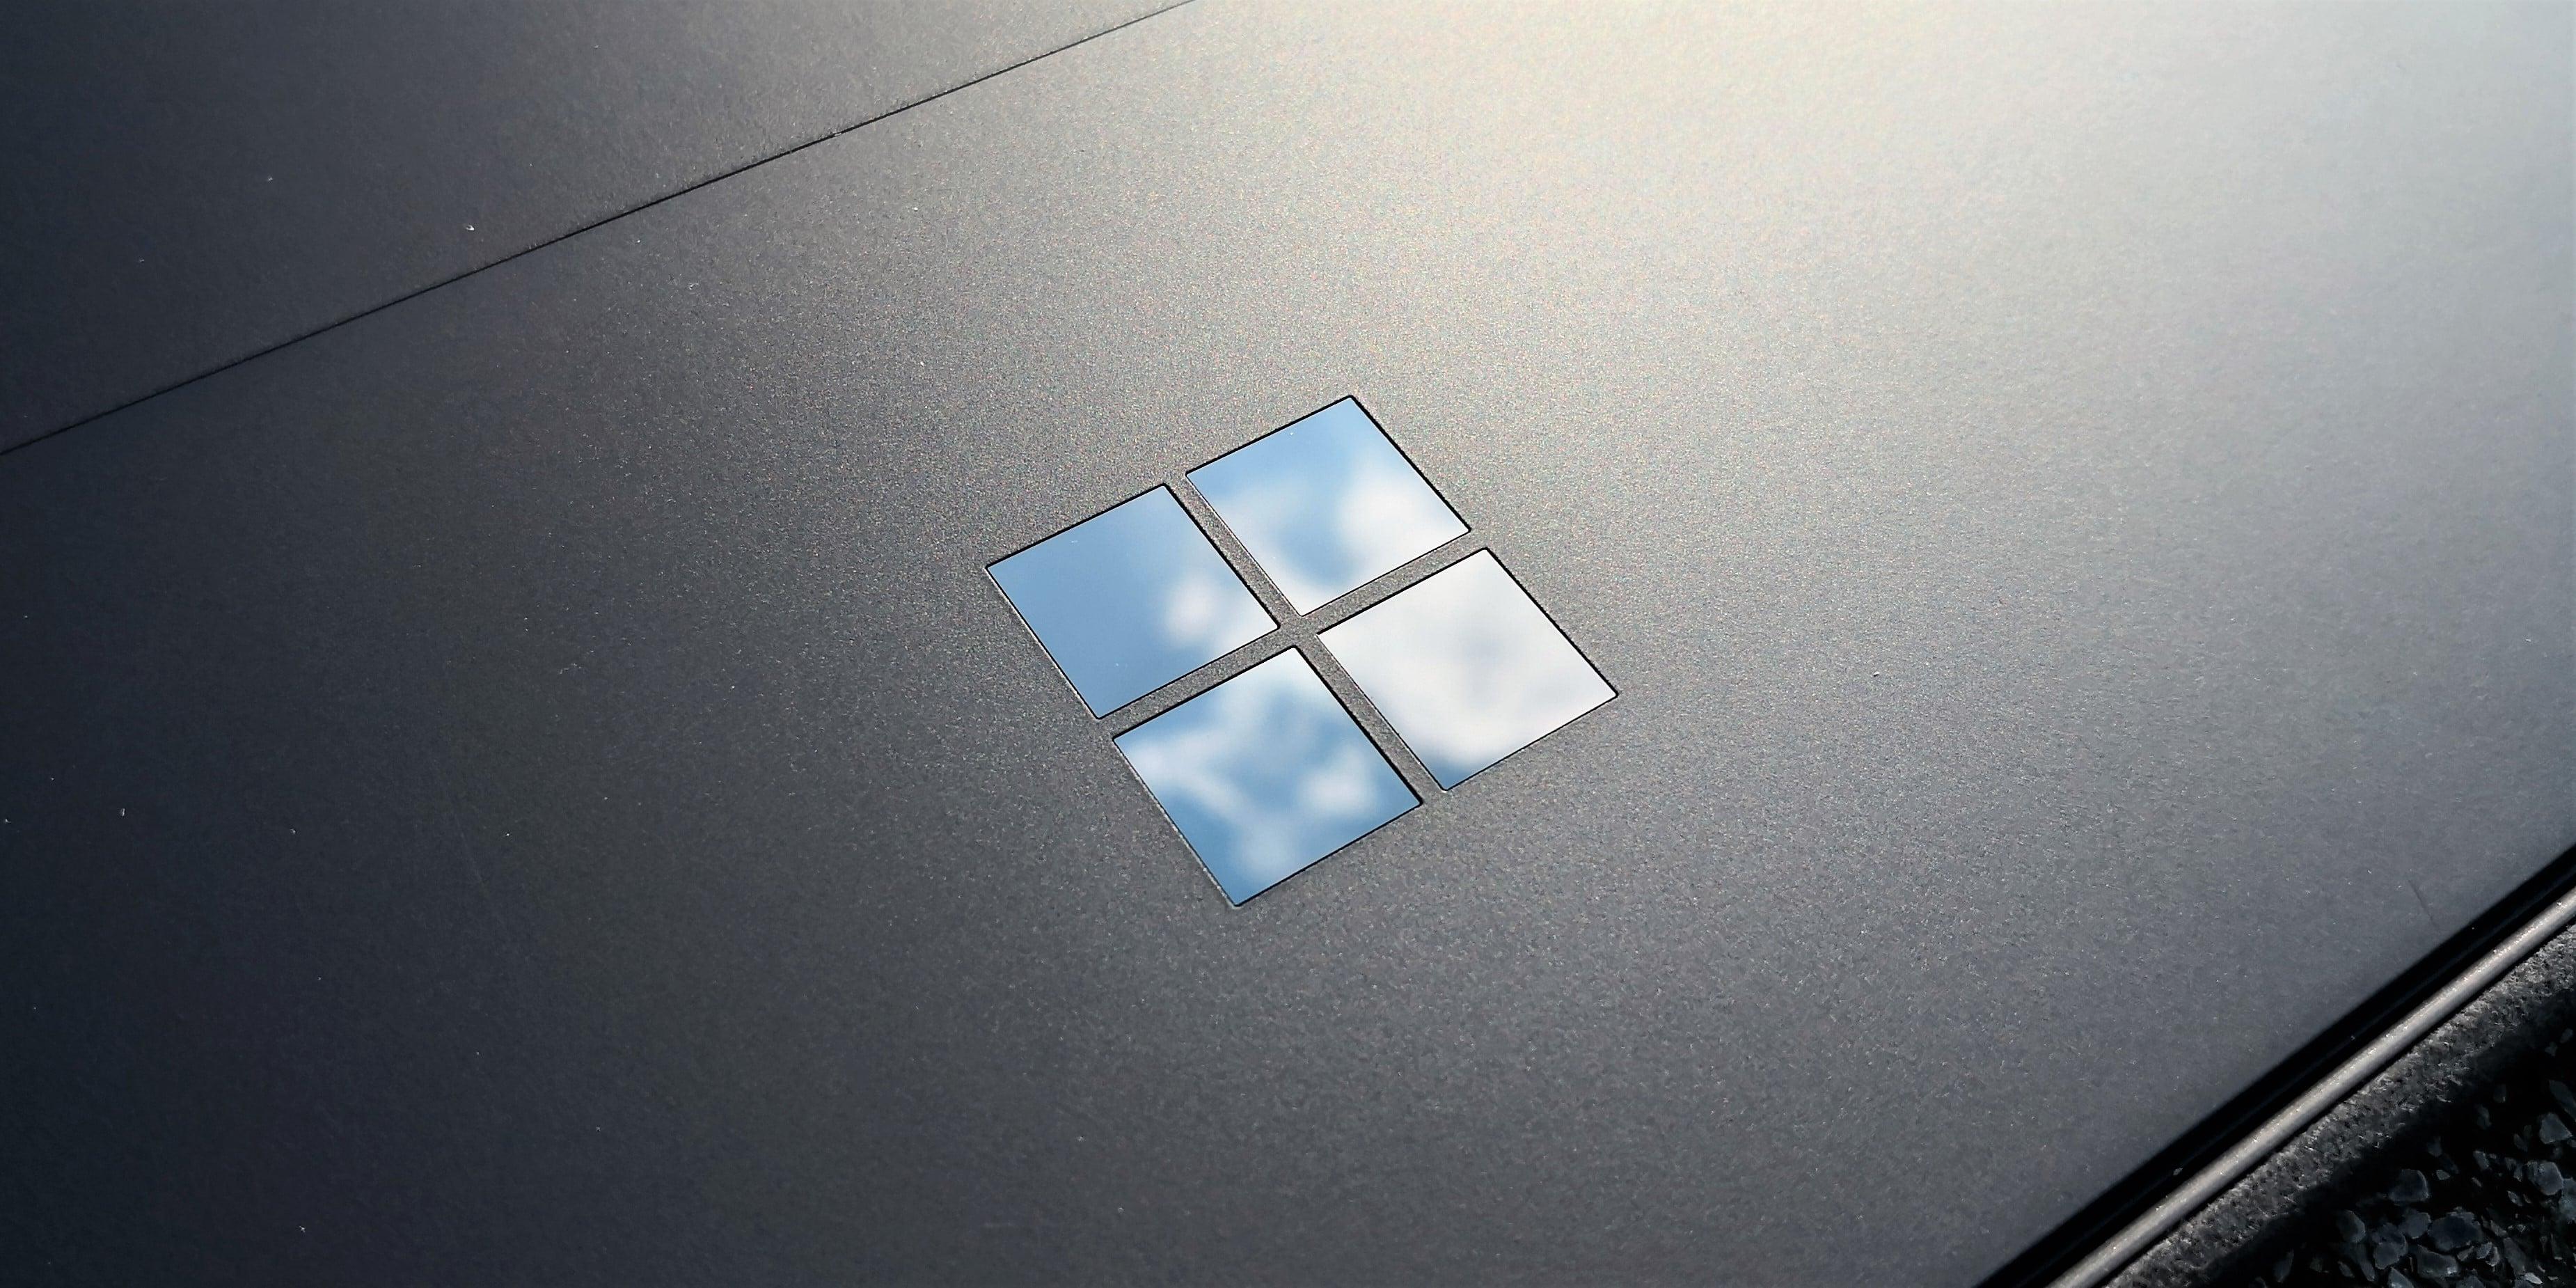 Po aktualizacji Microsoftu, procesory Surface Pro 6 i Surface Book 2 blokują się na 400 MHz 23